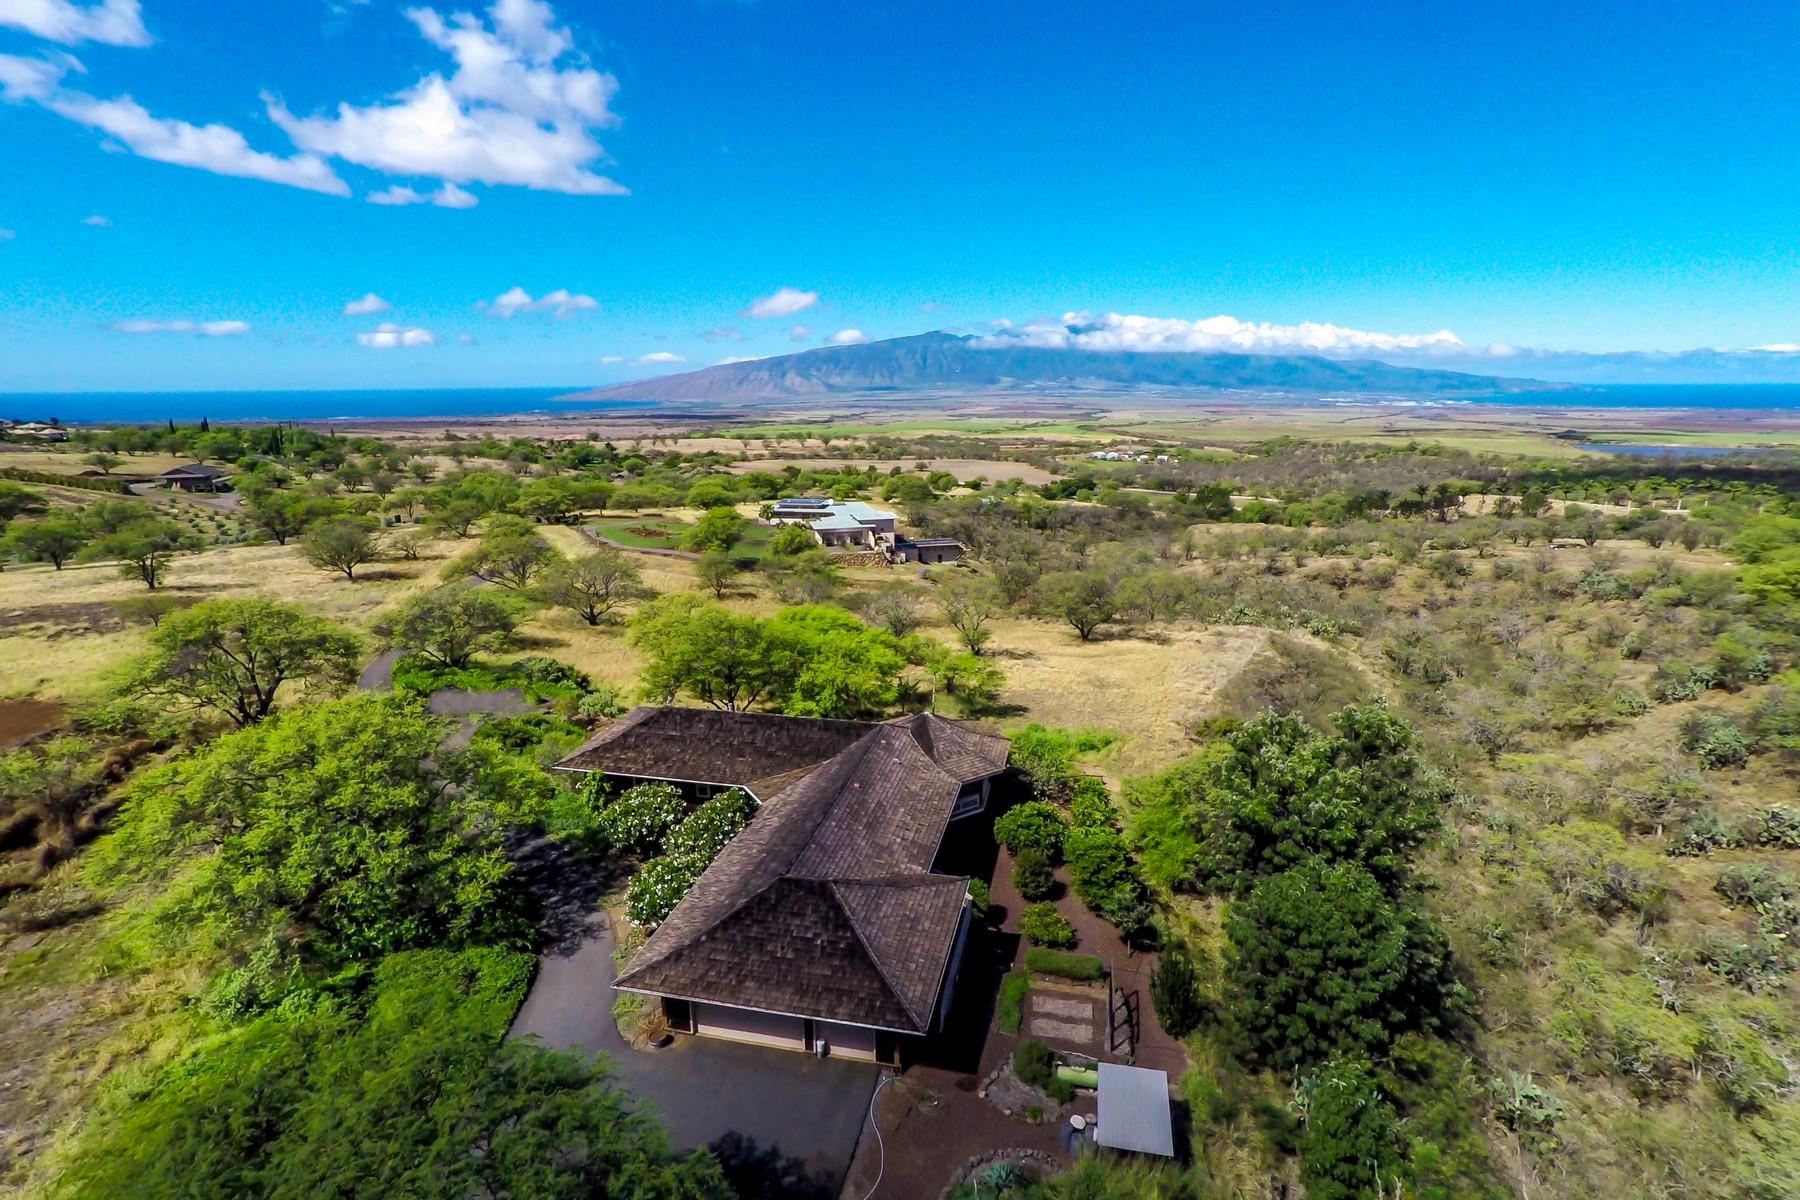 Tek Ailelik Ev için Satış at Maui Upcountry Classic Plantation Home On 6 Acres 101 Ikena Kai Place Kula, Hawaii, 96790 Amerika Birleşik Devletleri